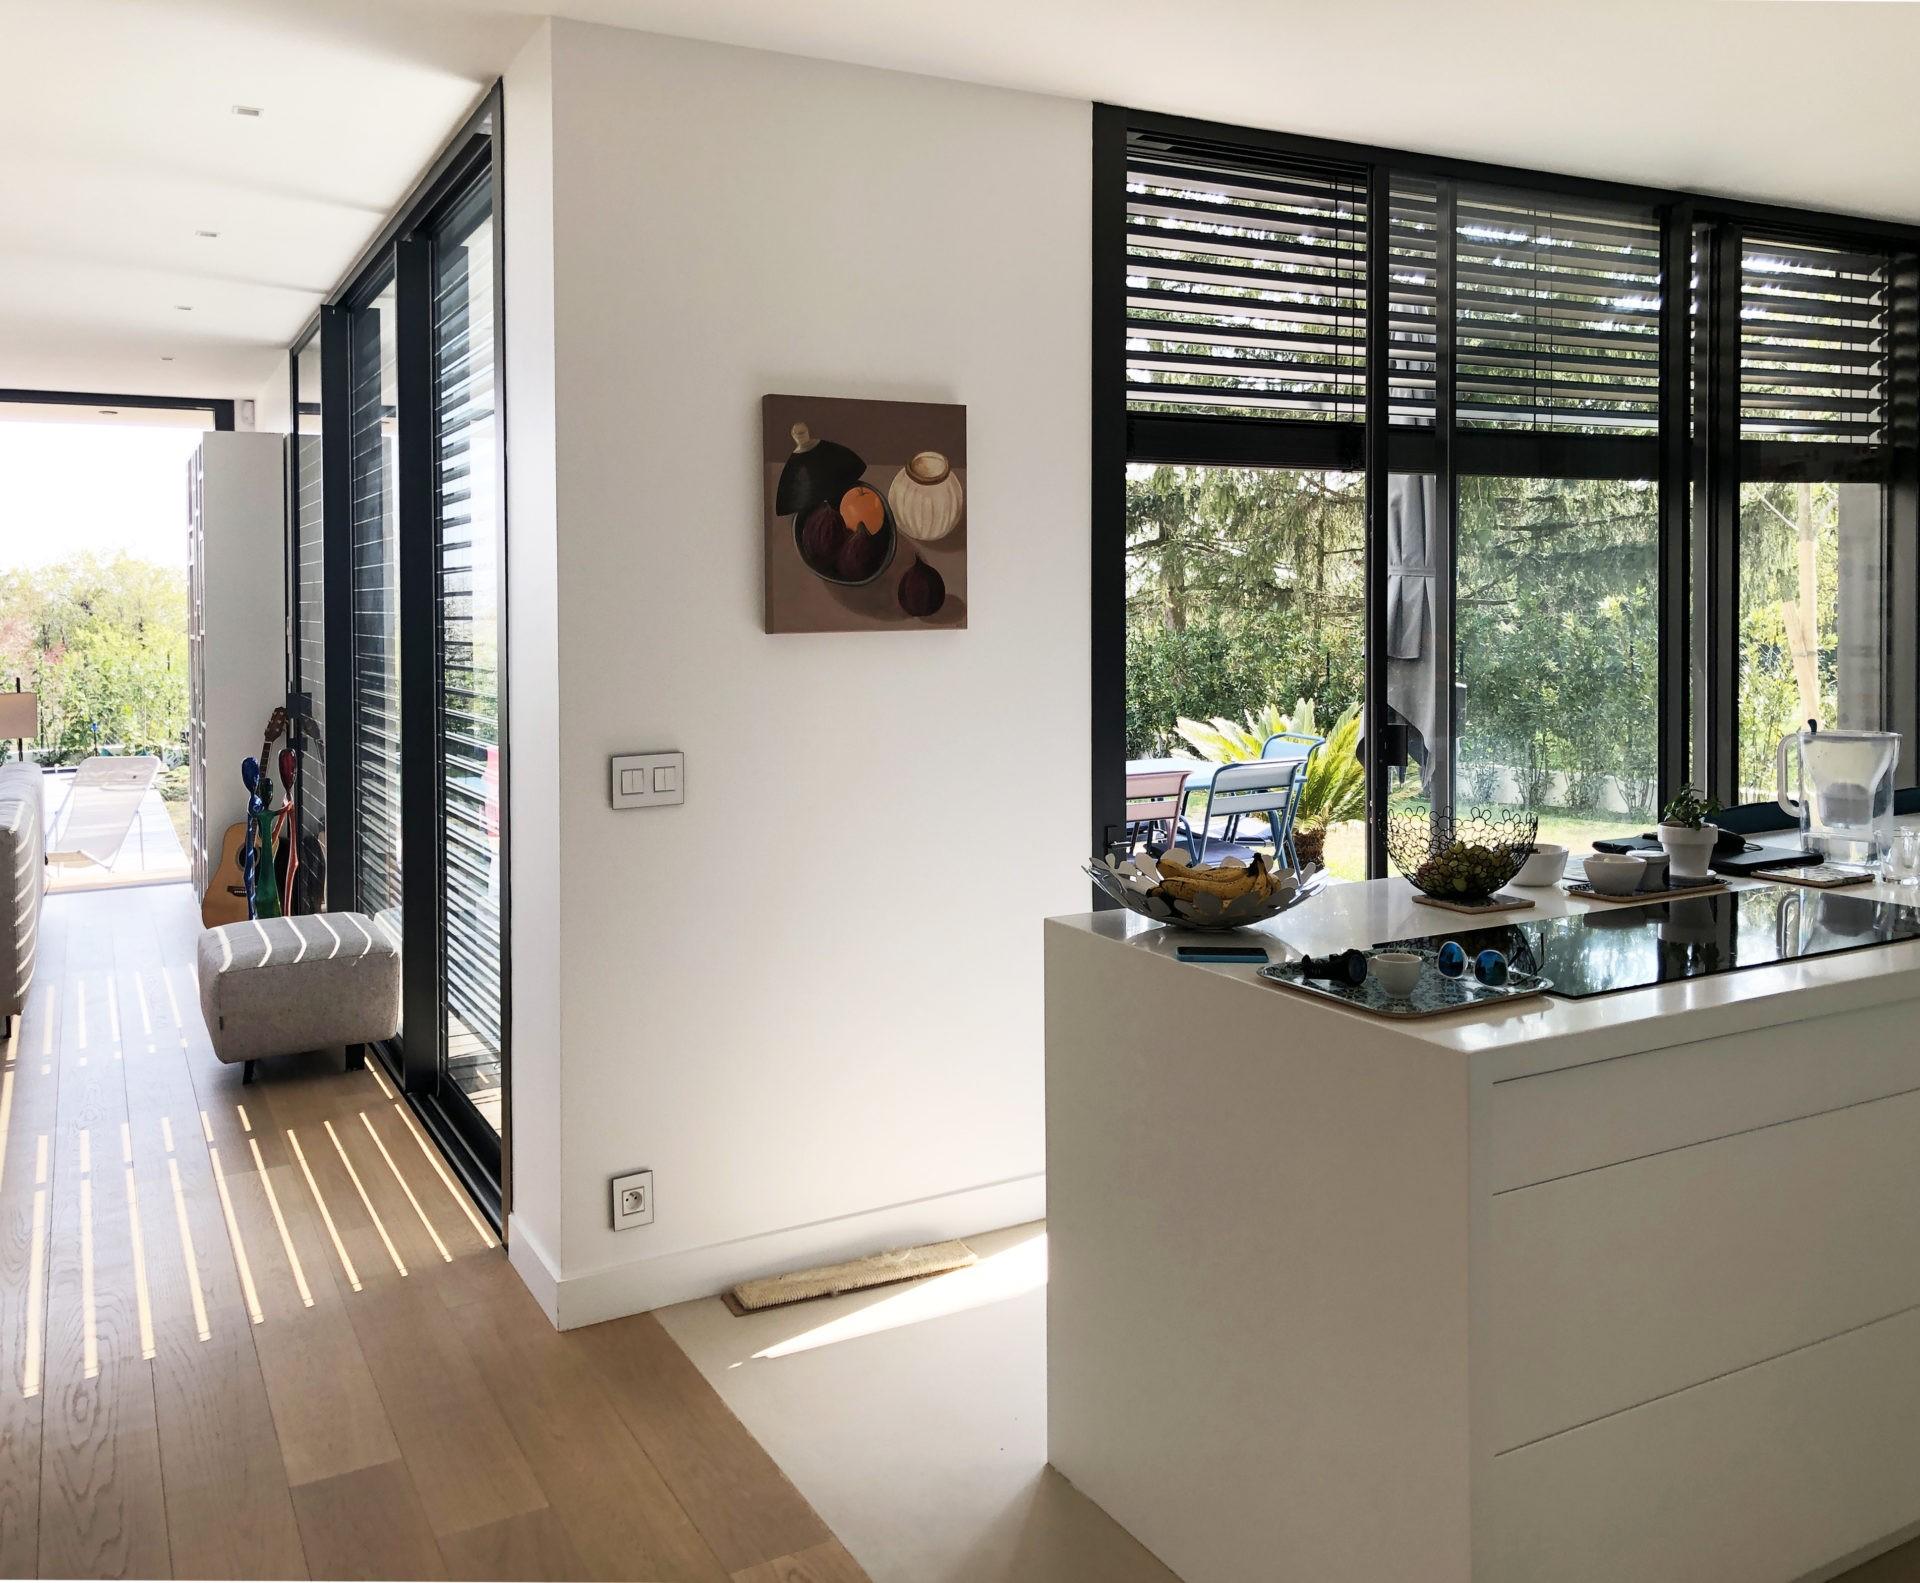 asb-architecture-maison-contemporaine-toiture-terrasse-cuisine ouverte